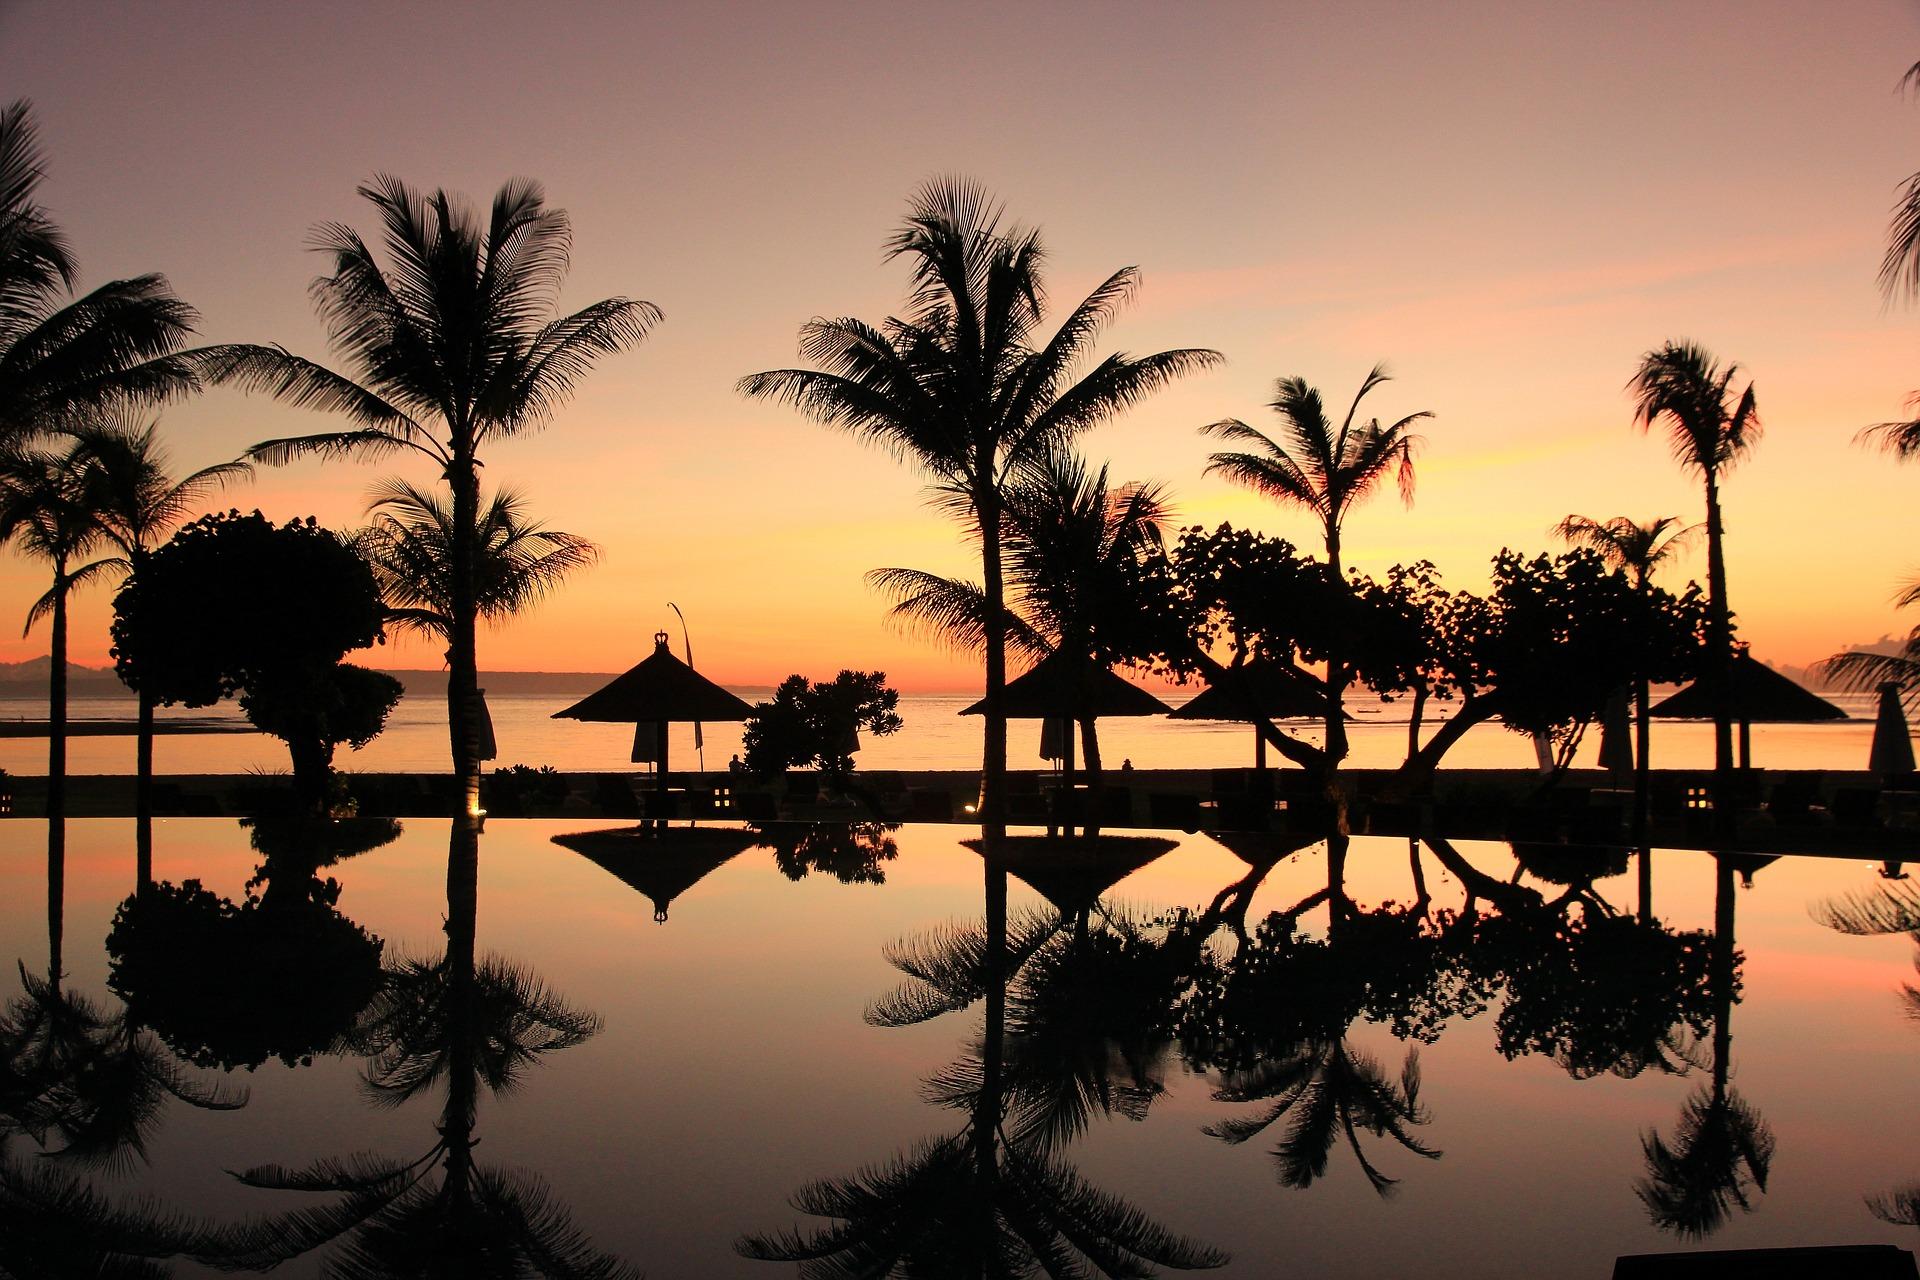 Indonezja - zachód słońca